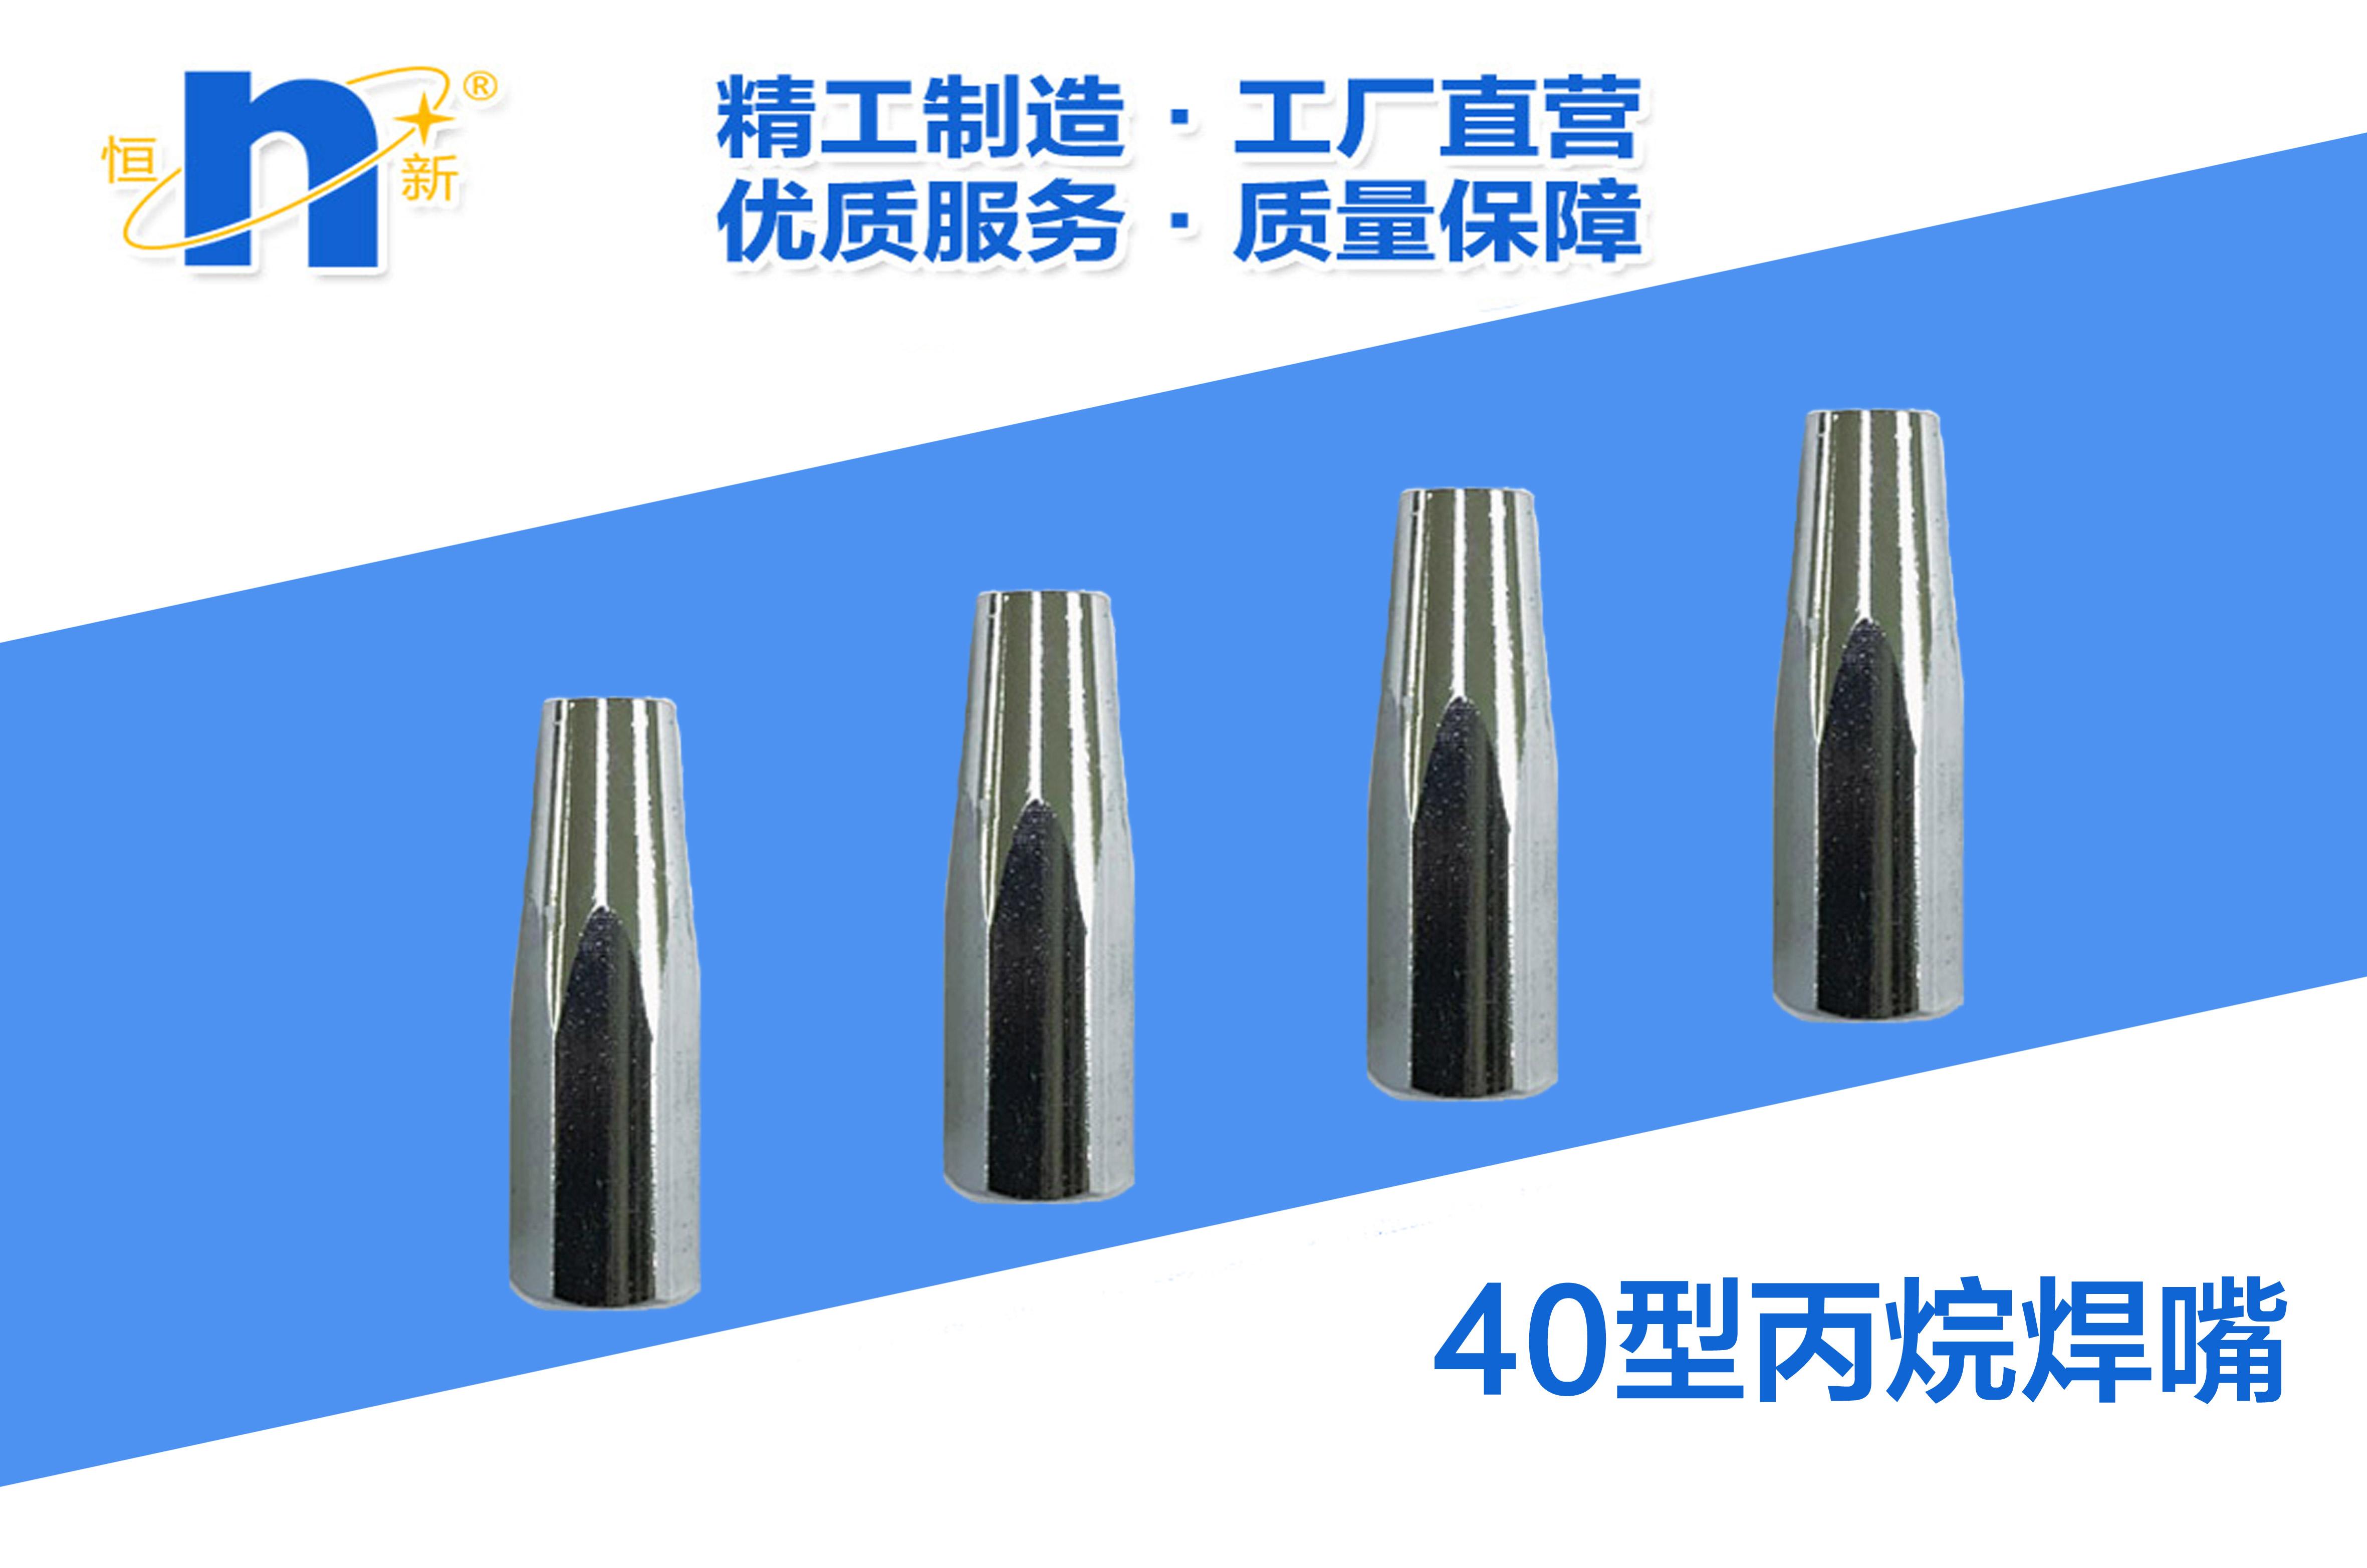 H07-40丙烷焊嘴  恒新